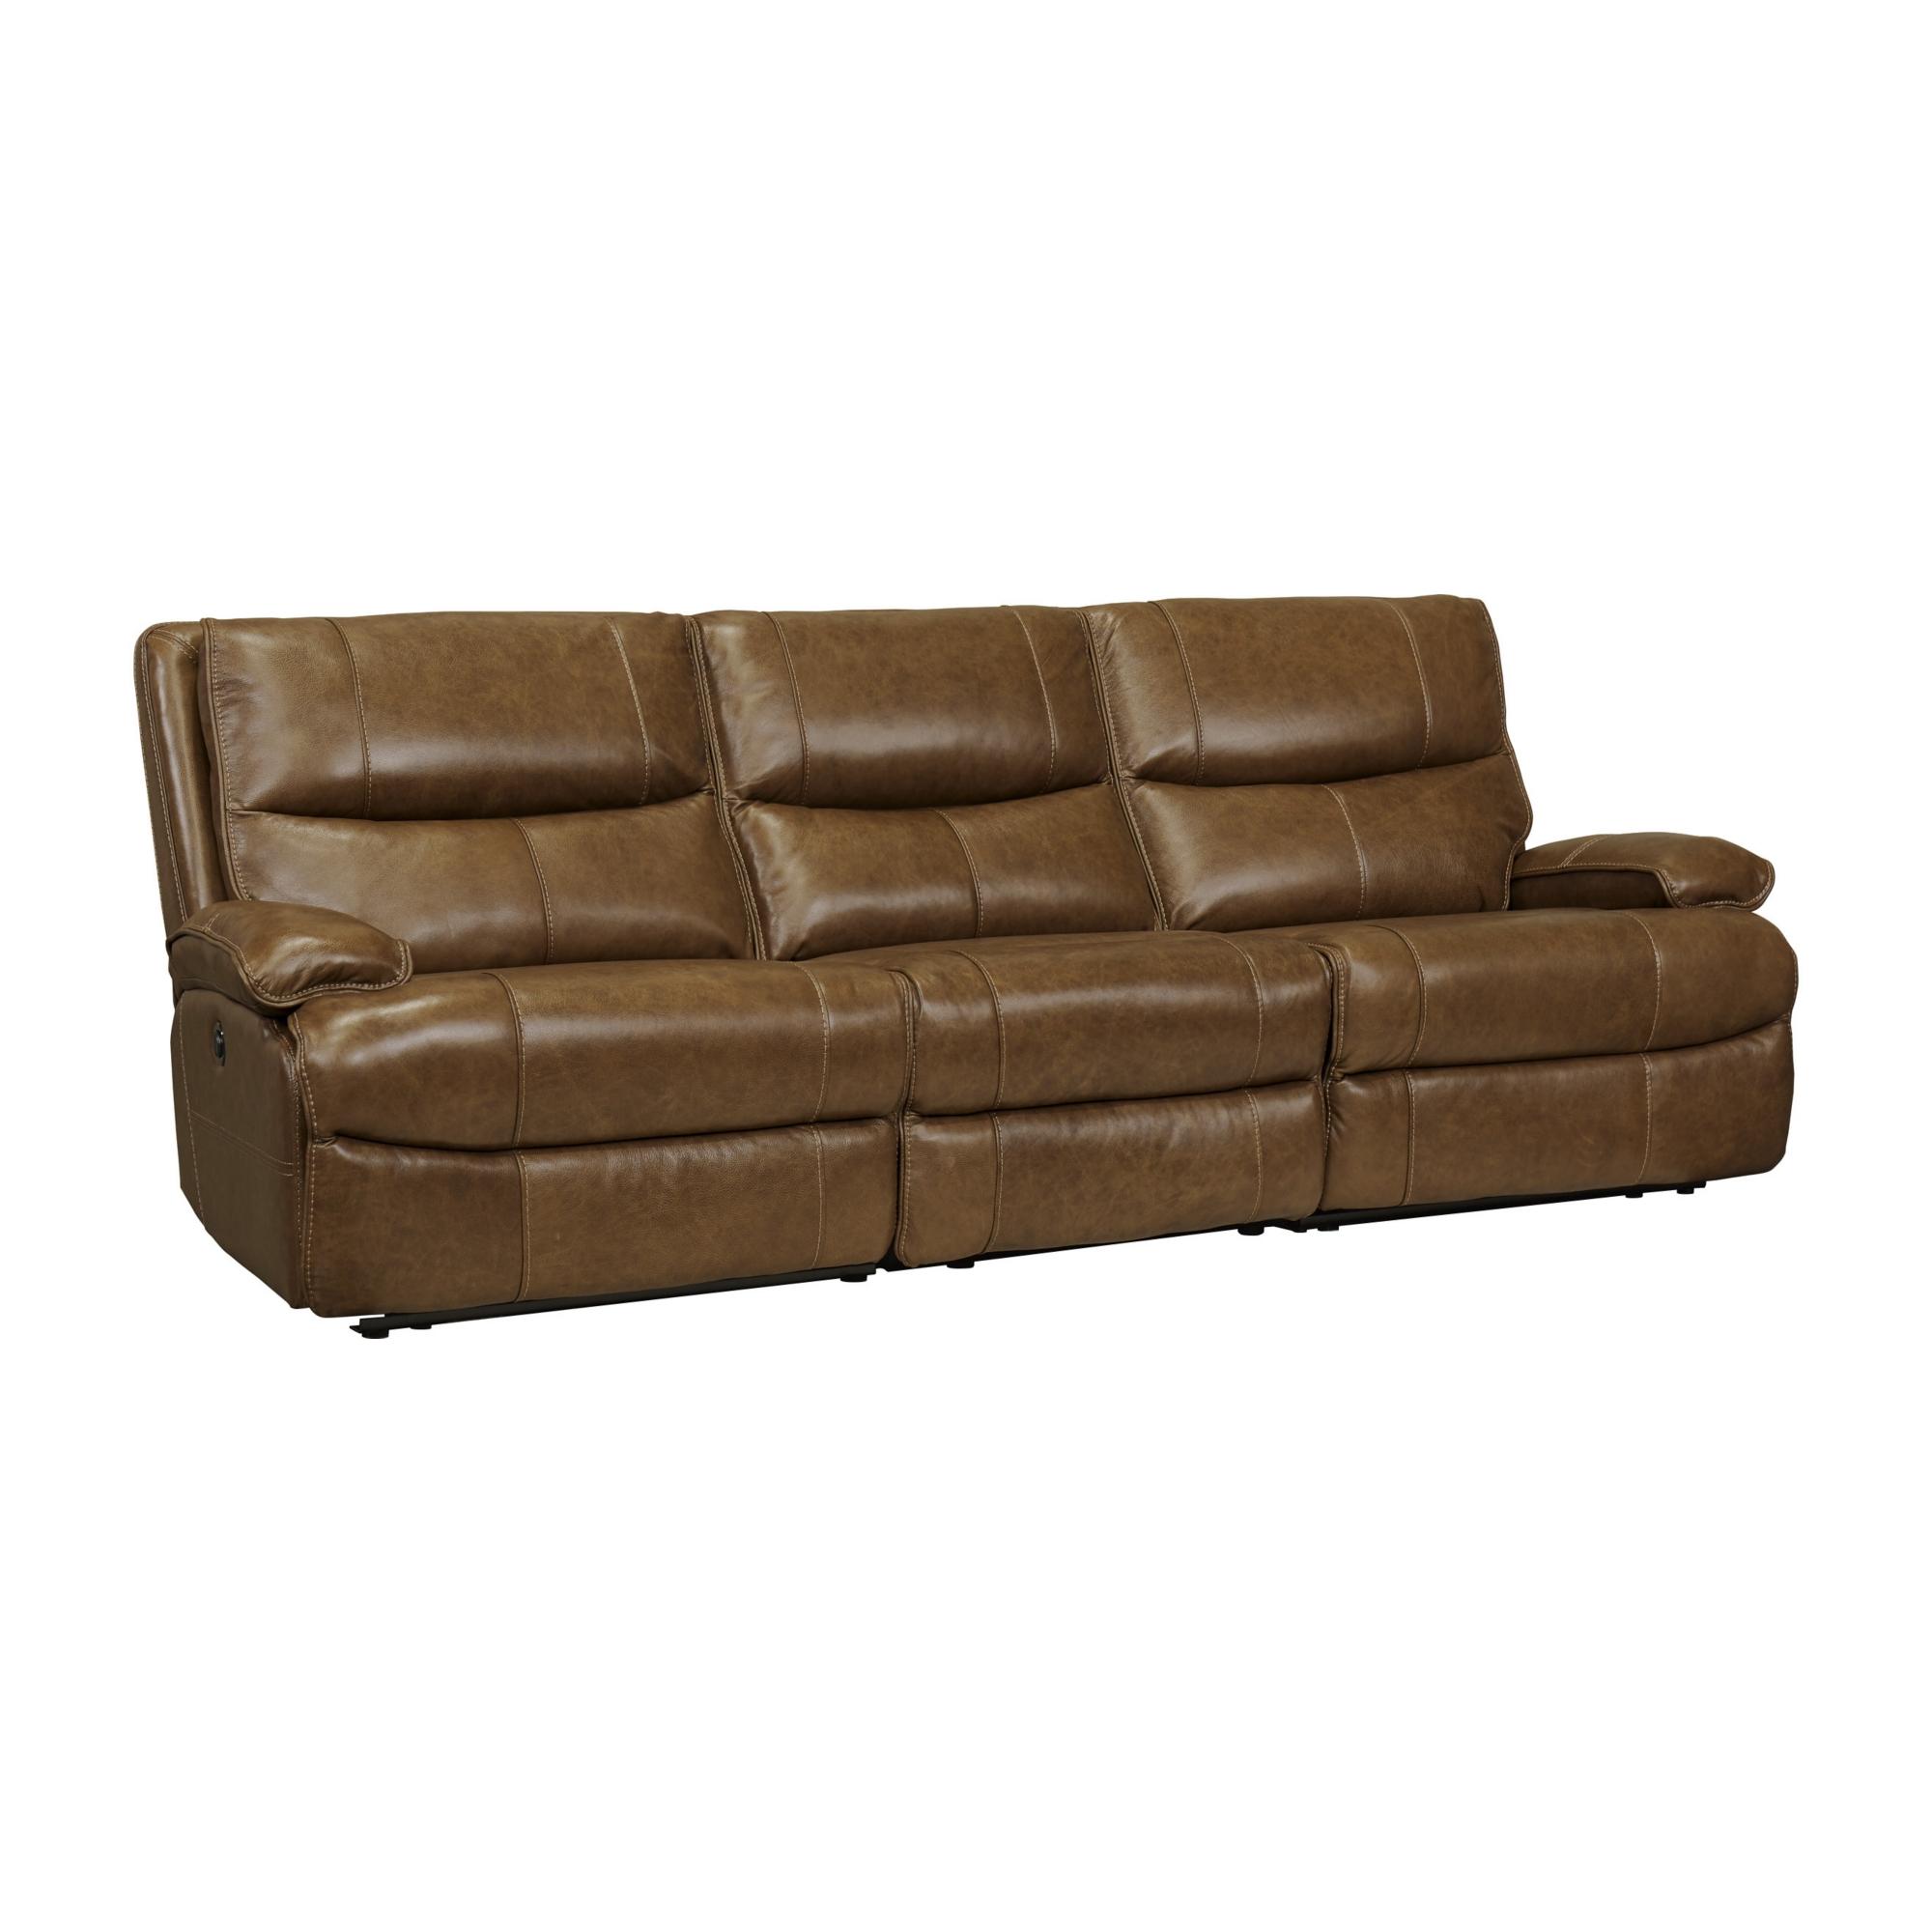 Main Nevada Sofa Image